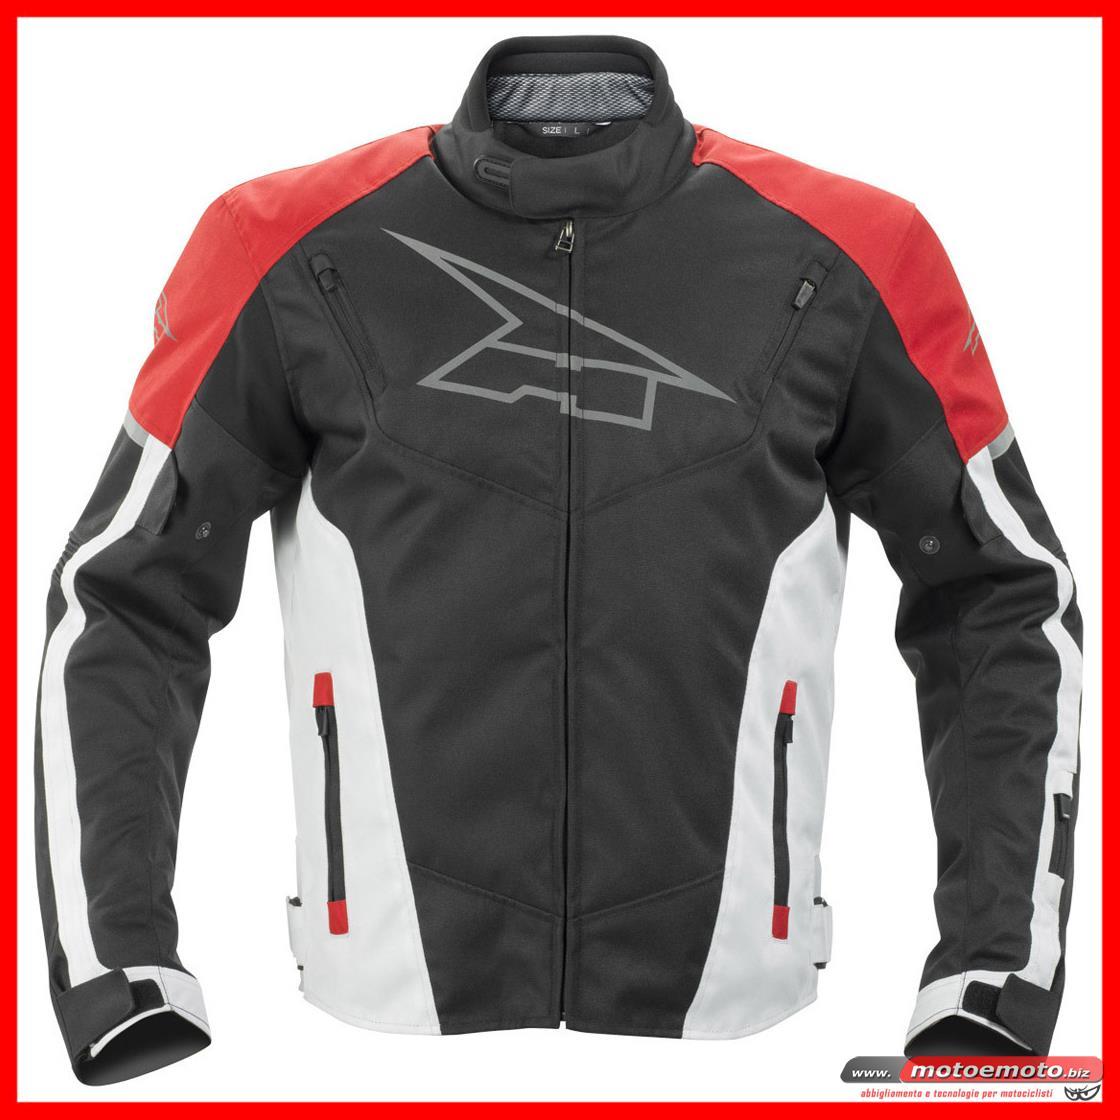 » Axo Tessuto E Moto Abbigliamento Giacche Giacca a4pwTqcCS